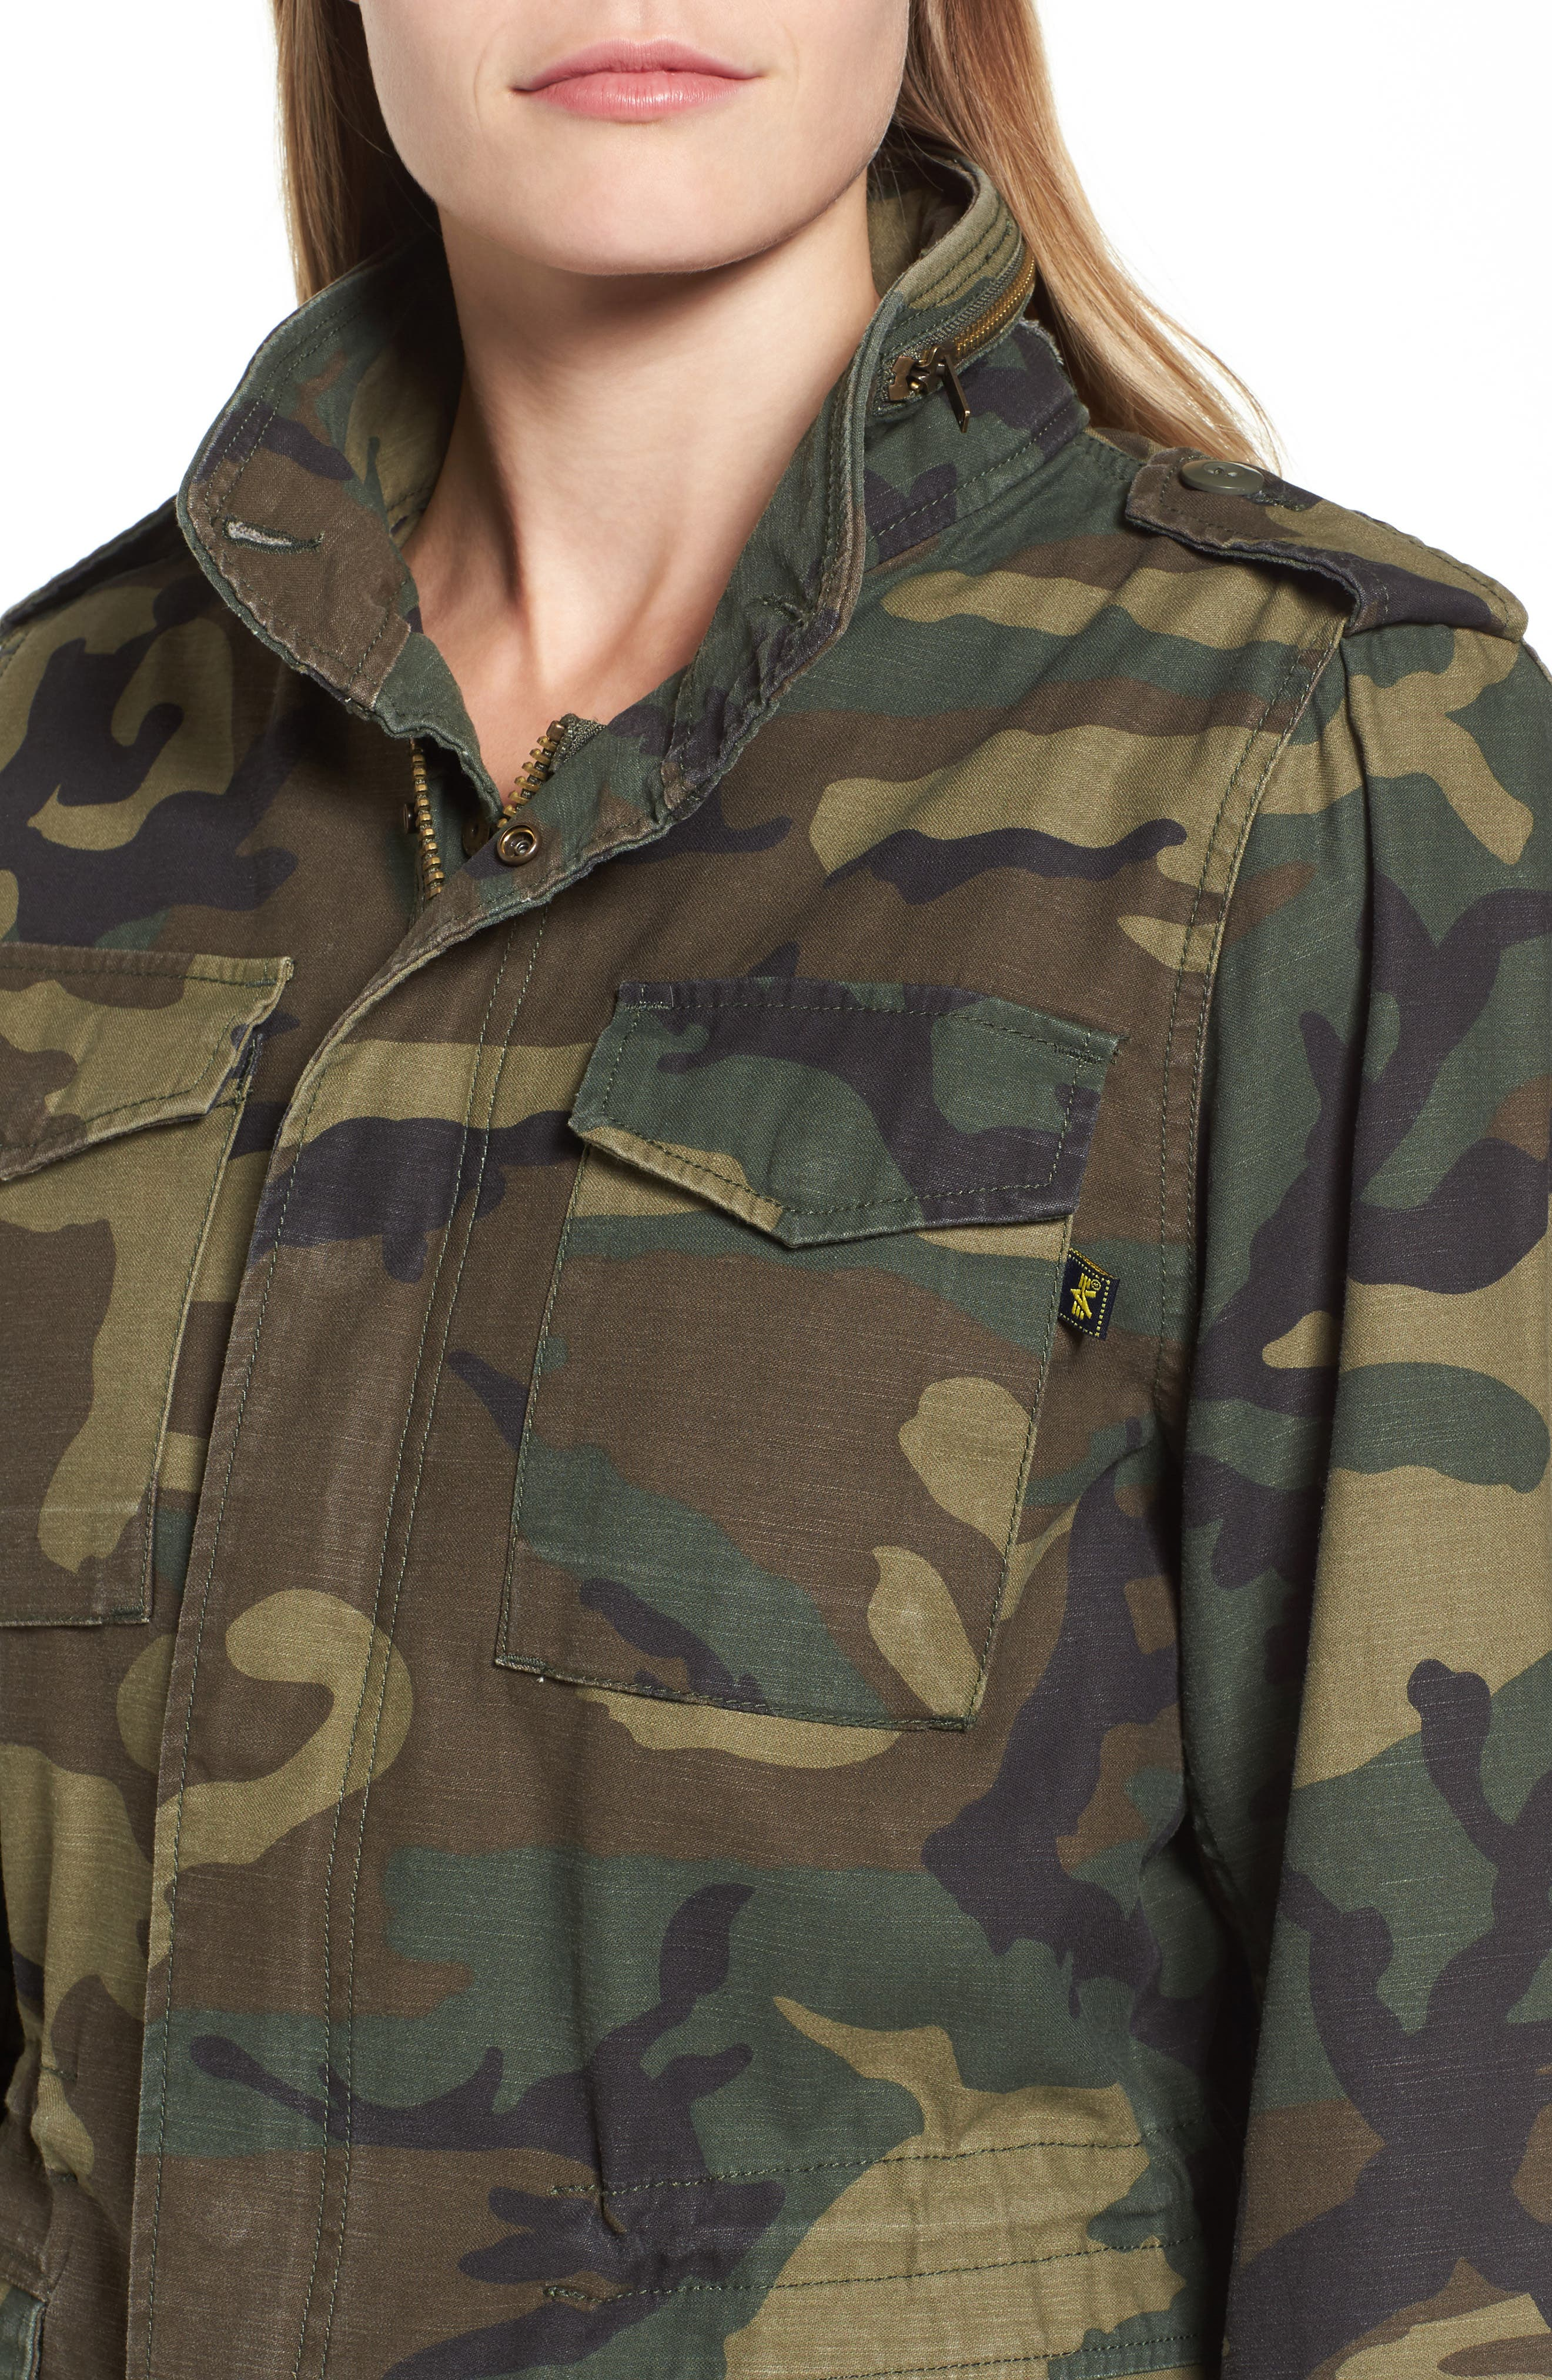 M-65 Defender Camo Field Jacket,                             Alternate thumbnail 4, color,                             Woodland Camo